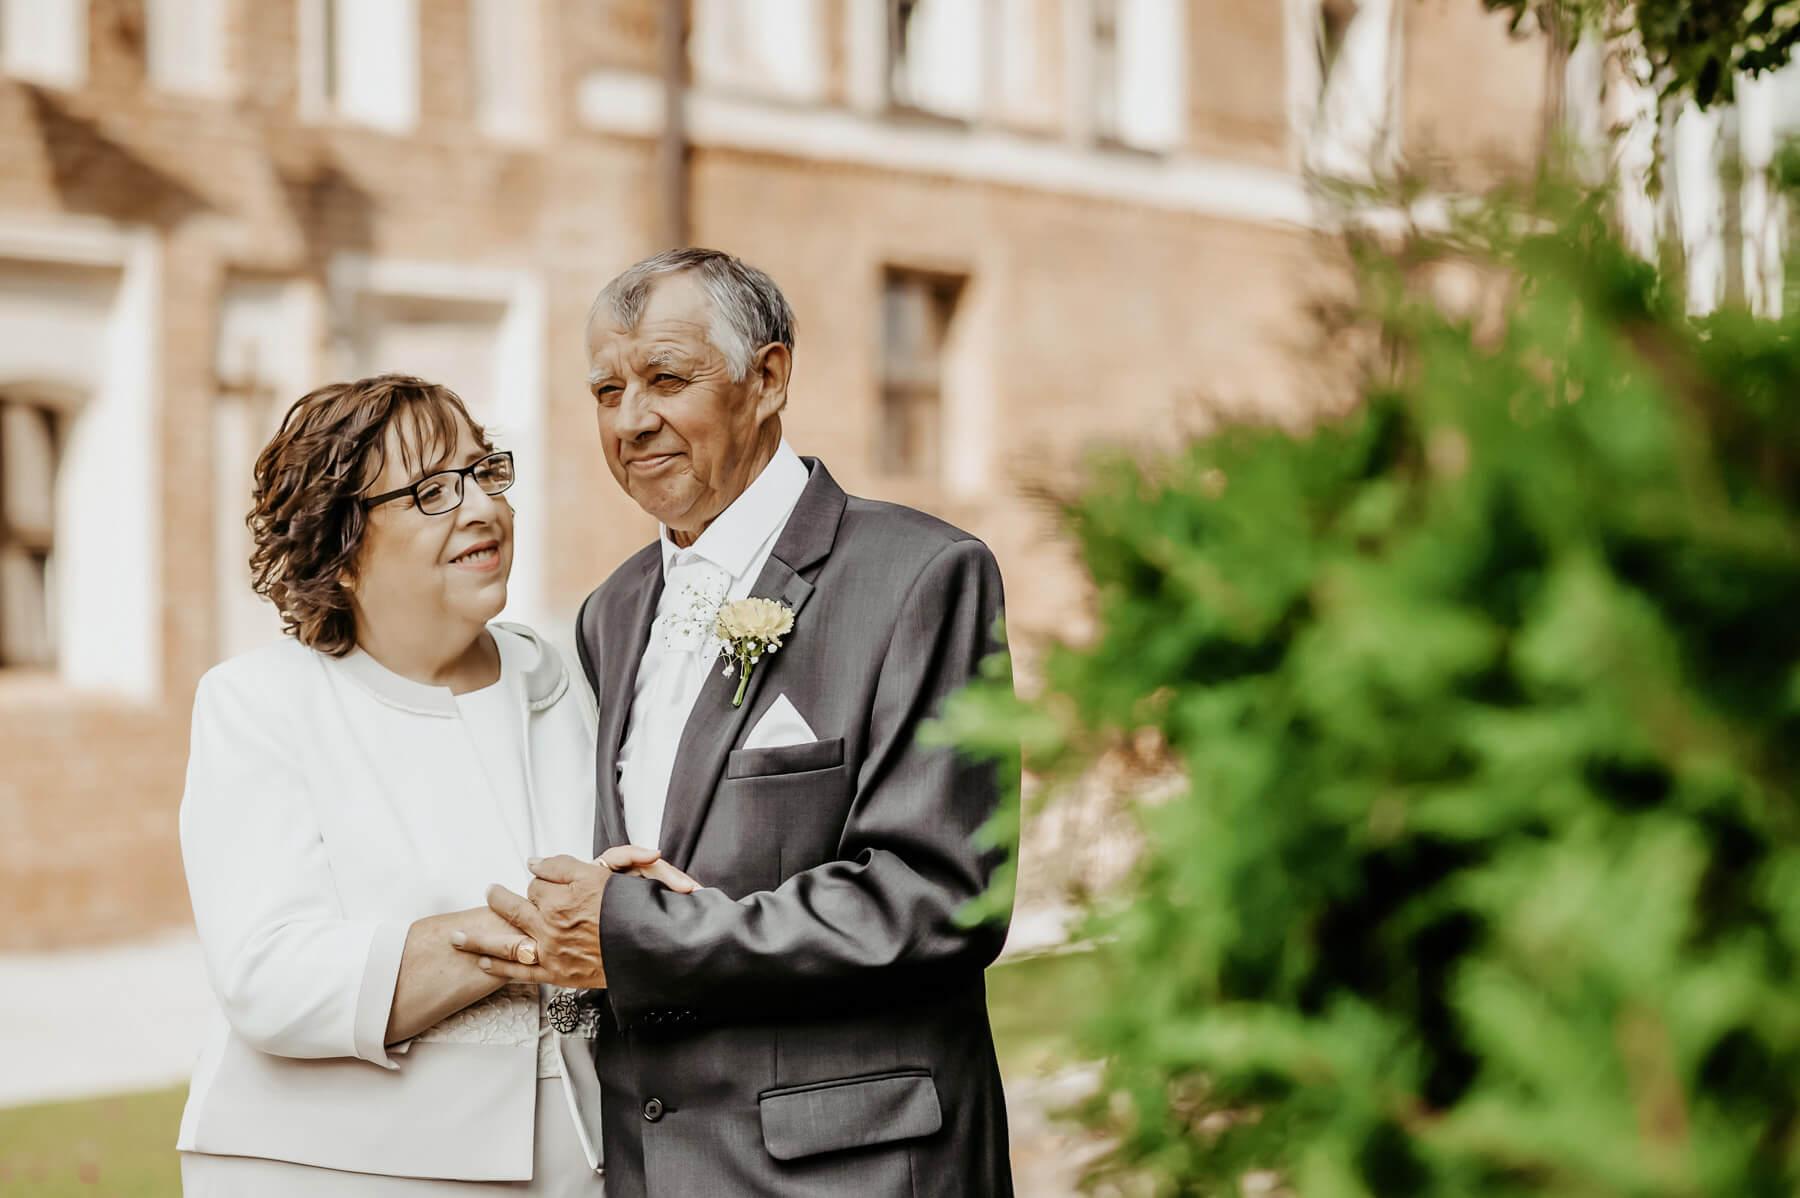 50 metu santuokos izadu atnaujinimas